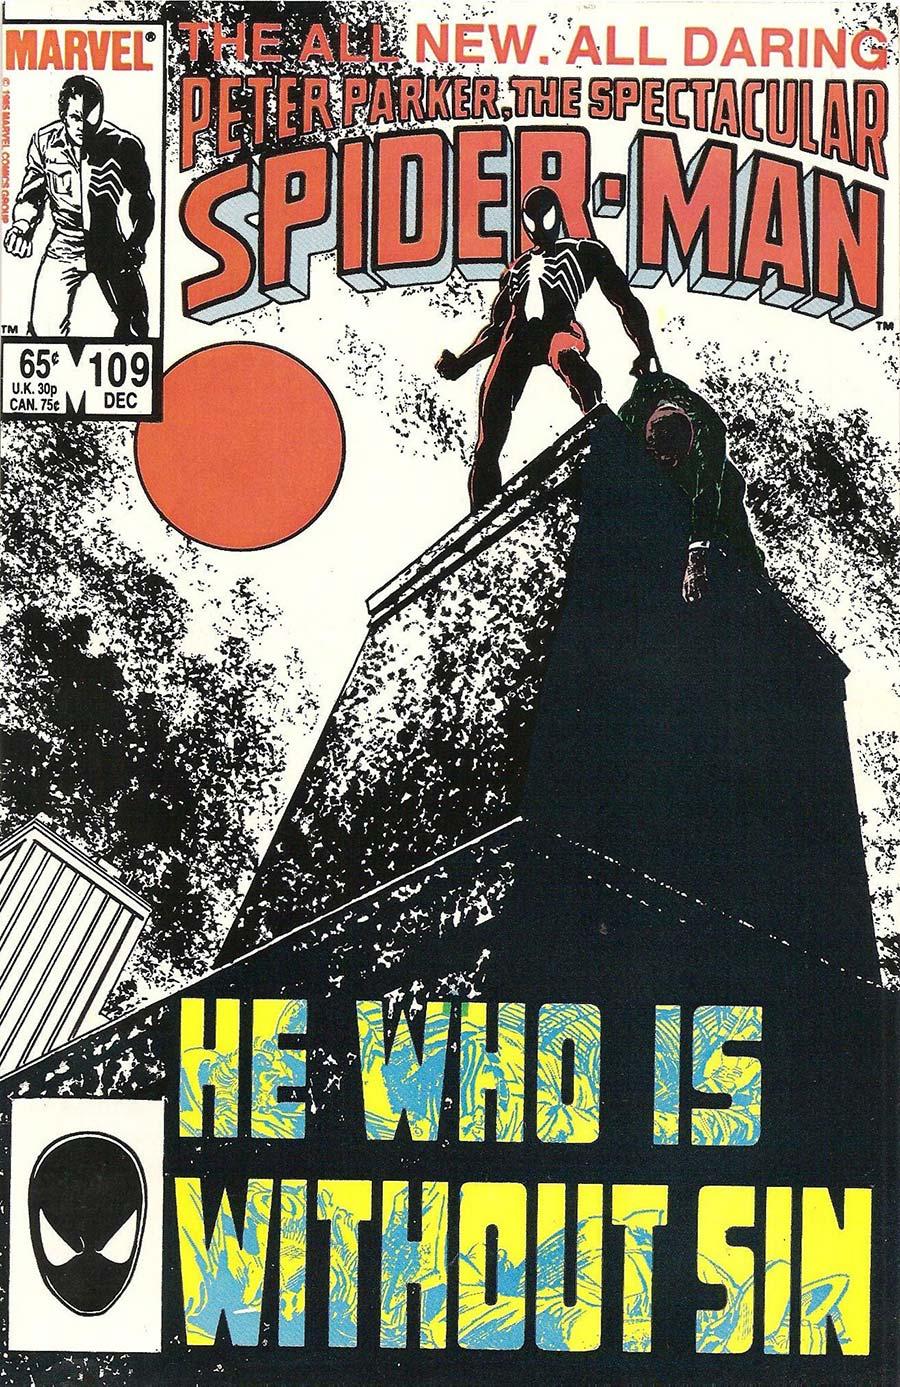 Spectacular Spider-Man (Peter David)